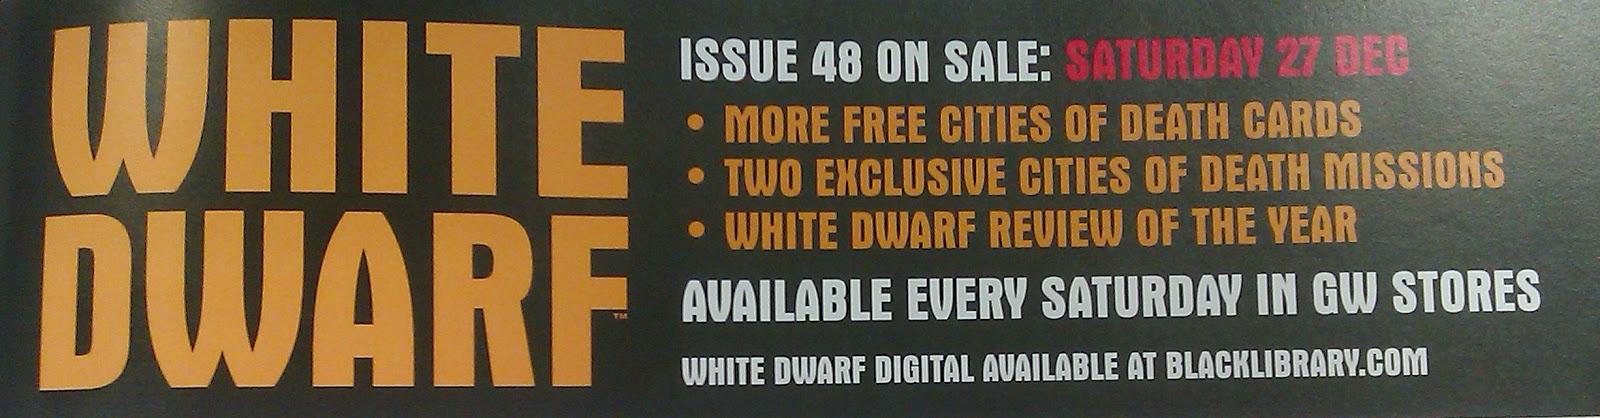 Adelanto de la White Dwarf Weekly número 48